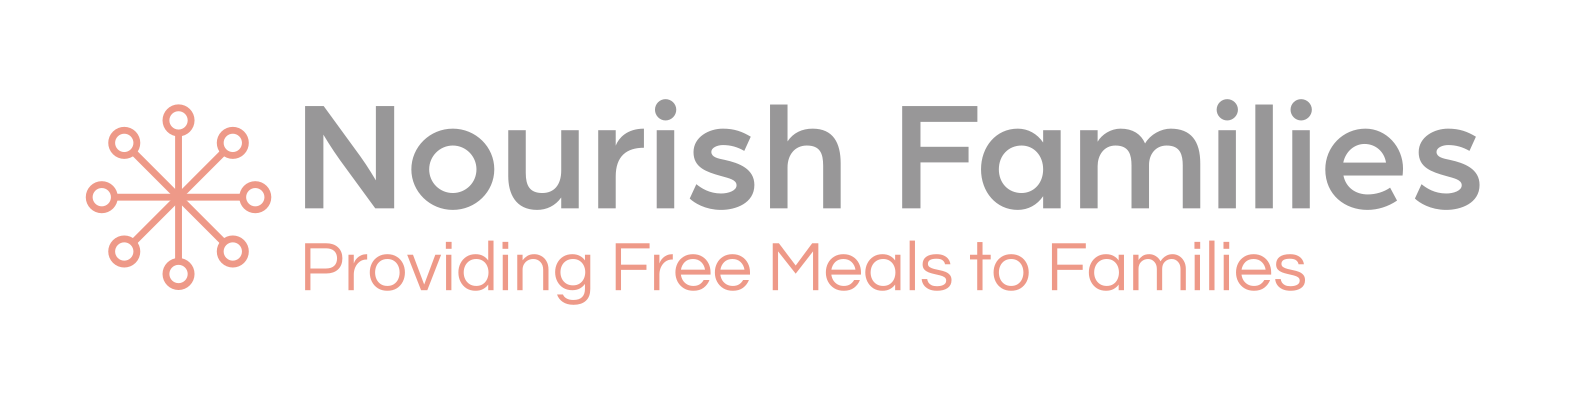 Nourish Families Logo